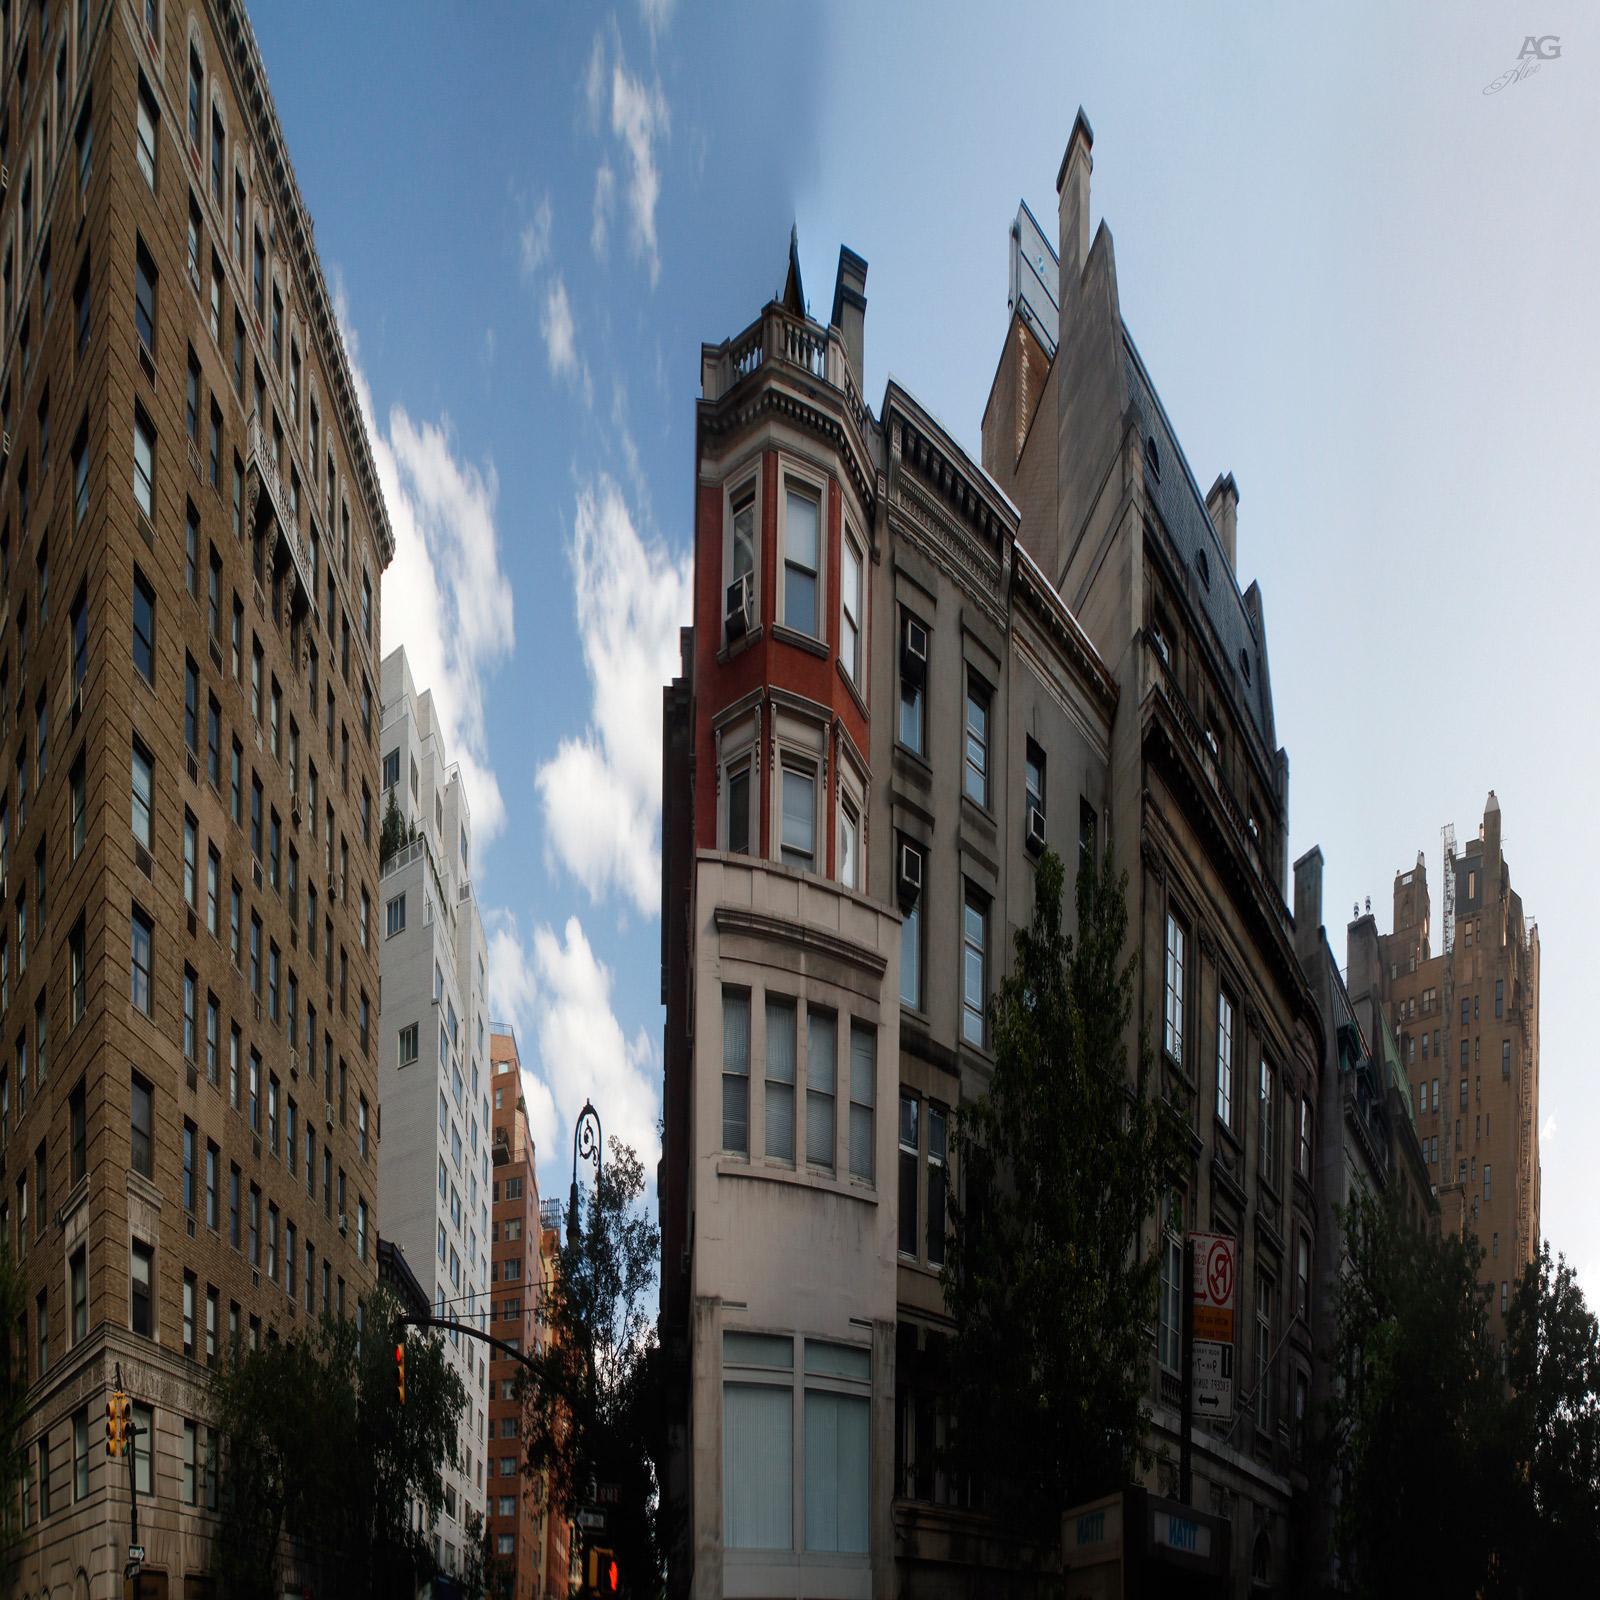 RoofOfManhattanStreet_1600